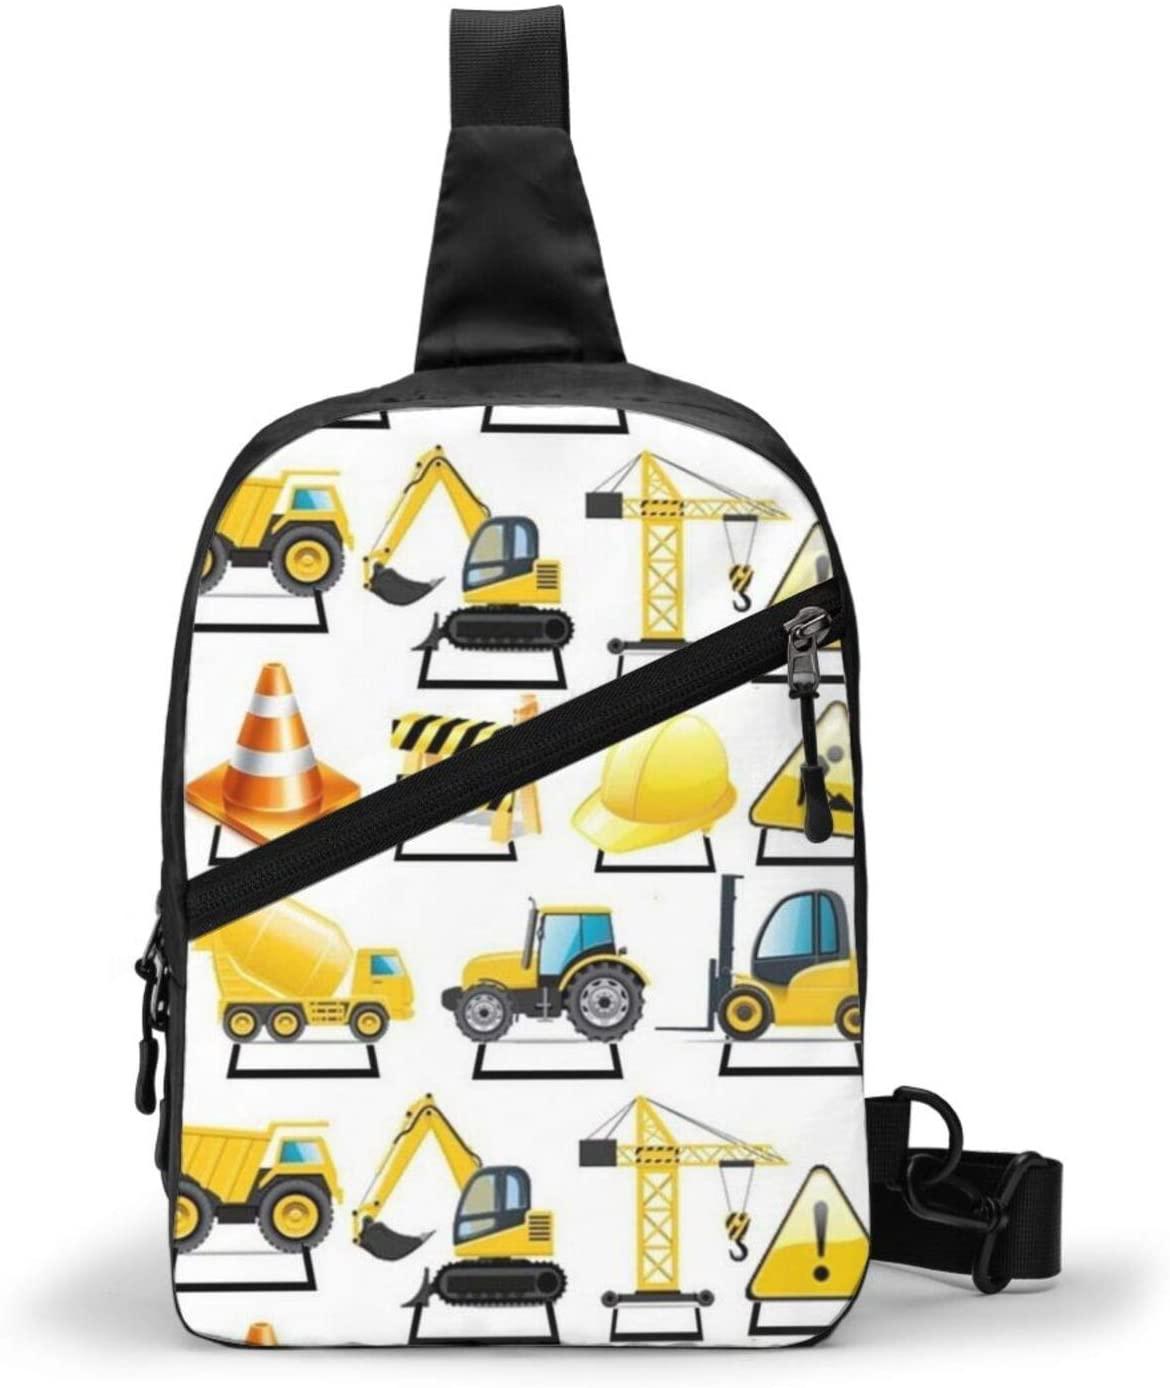 Neddelo Construction Trucks Crossbody Bag,Portable Chest Bags,Folding Chest Bag, Men's and Women Sling Bag for Travel,Hiking, Cycling,Camping